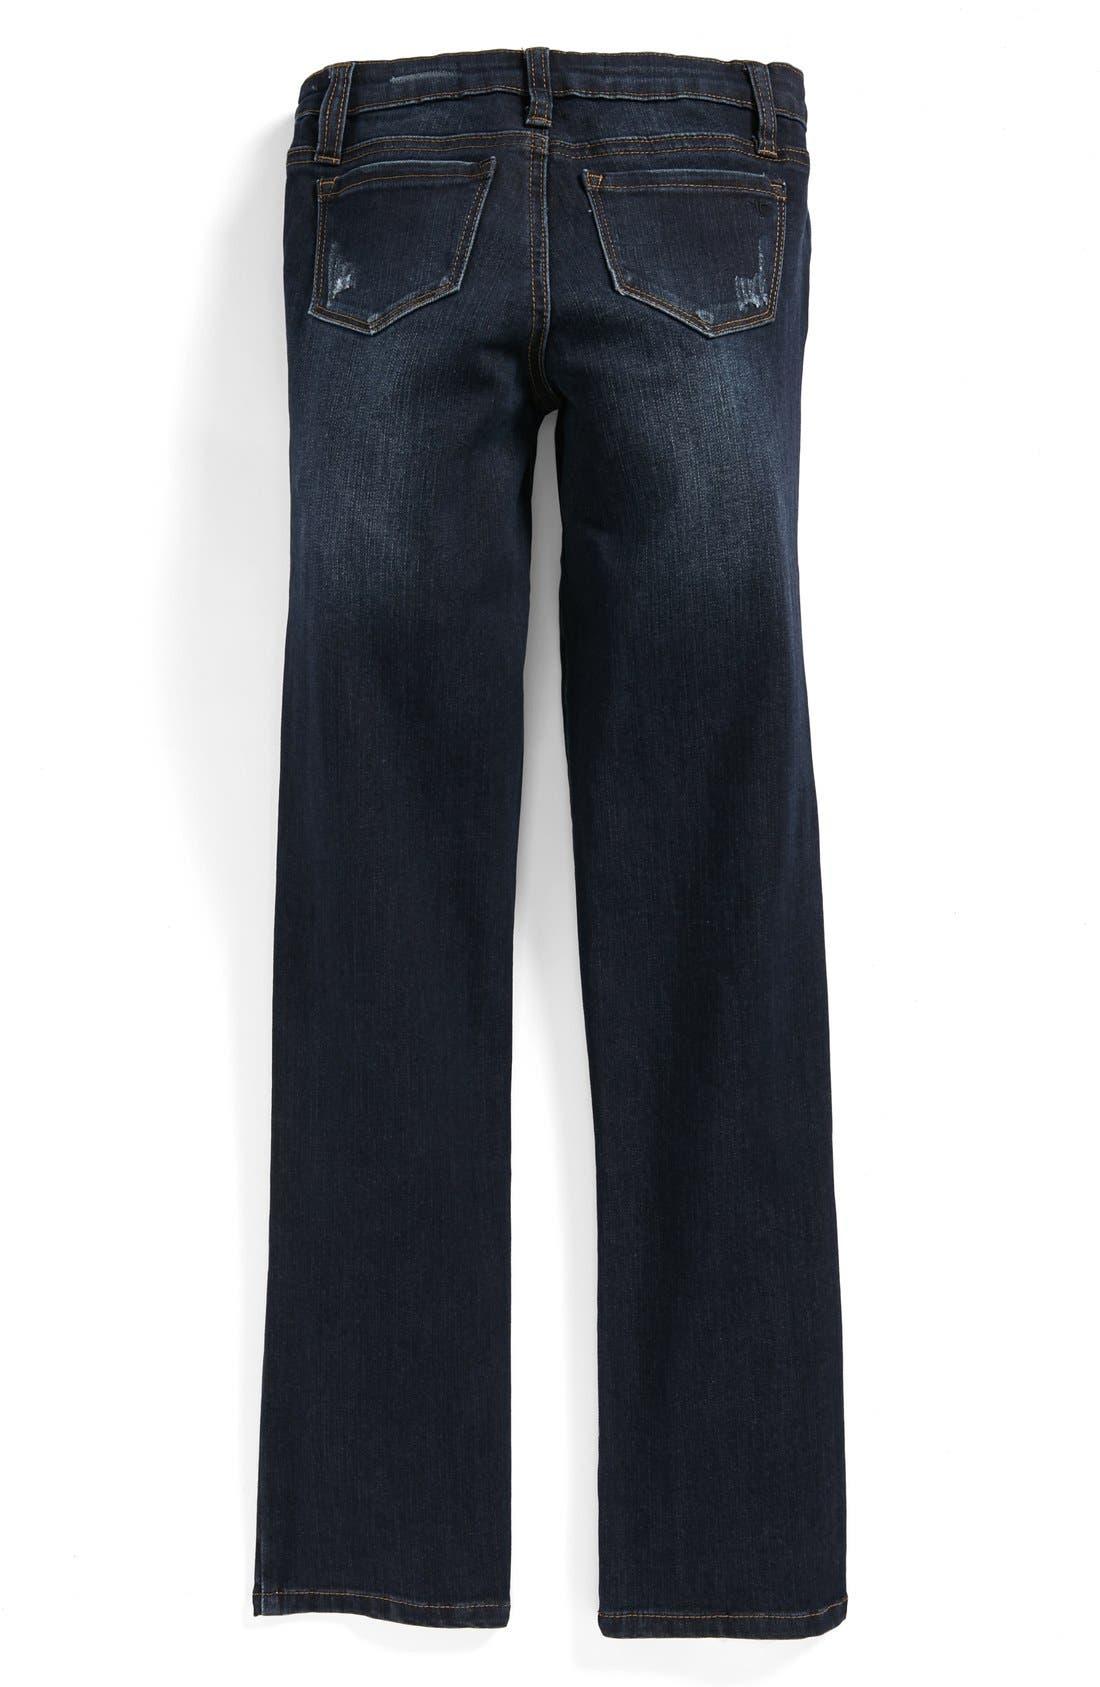 Alternate Image 1 Selected - Tractr Boyfriend Jeans (Big Girls)